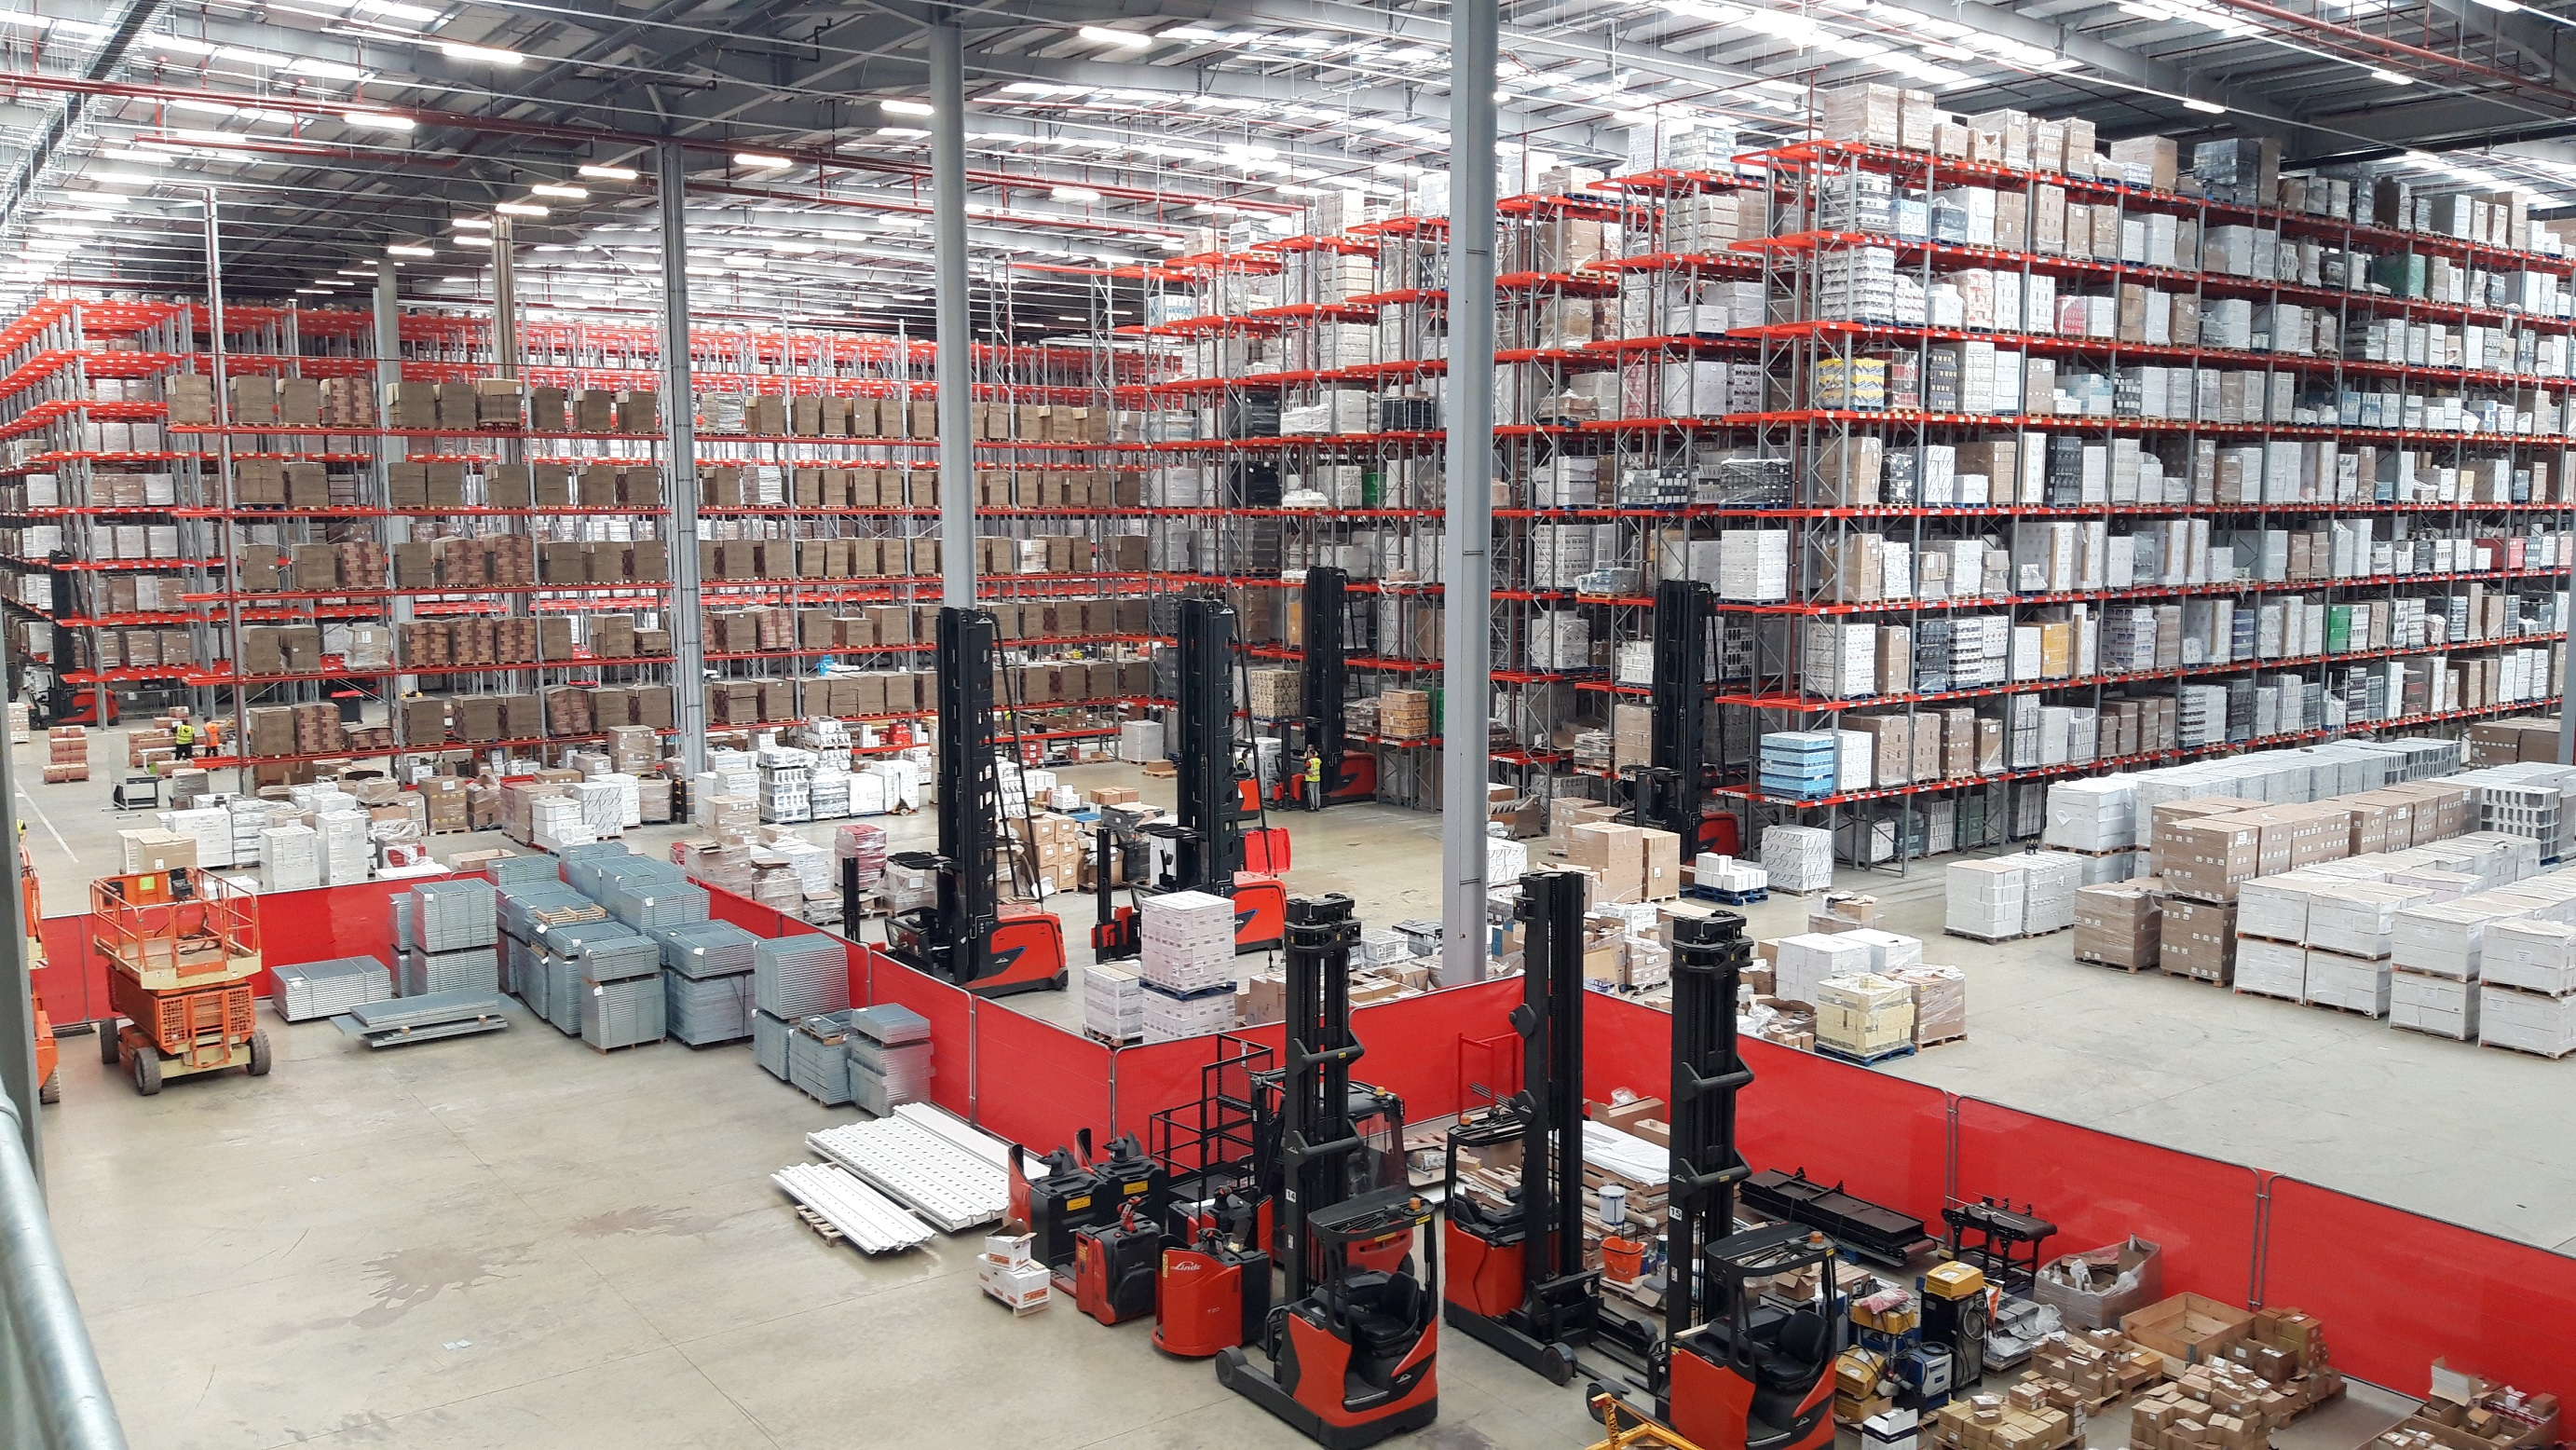 Local Logistics Firm Reveals Top 100 Place